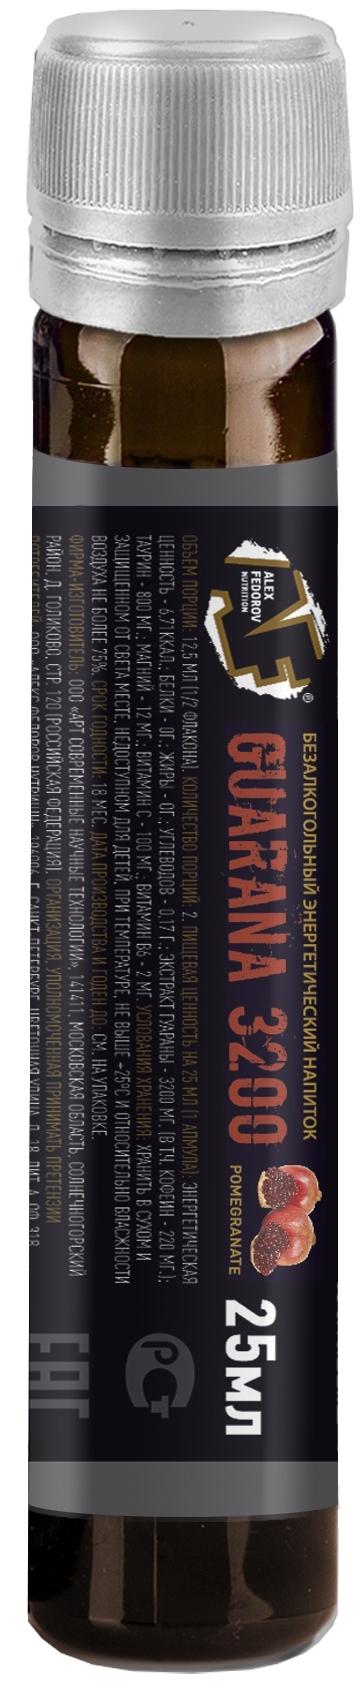 Алекс федоров нутришн гуарана 3200 ампулы 25 мл №20 со вкусом граната